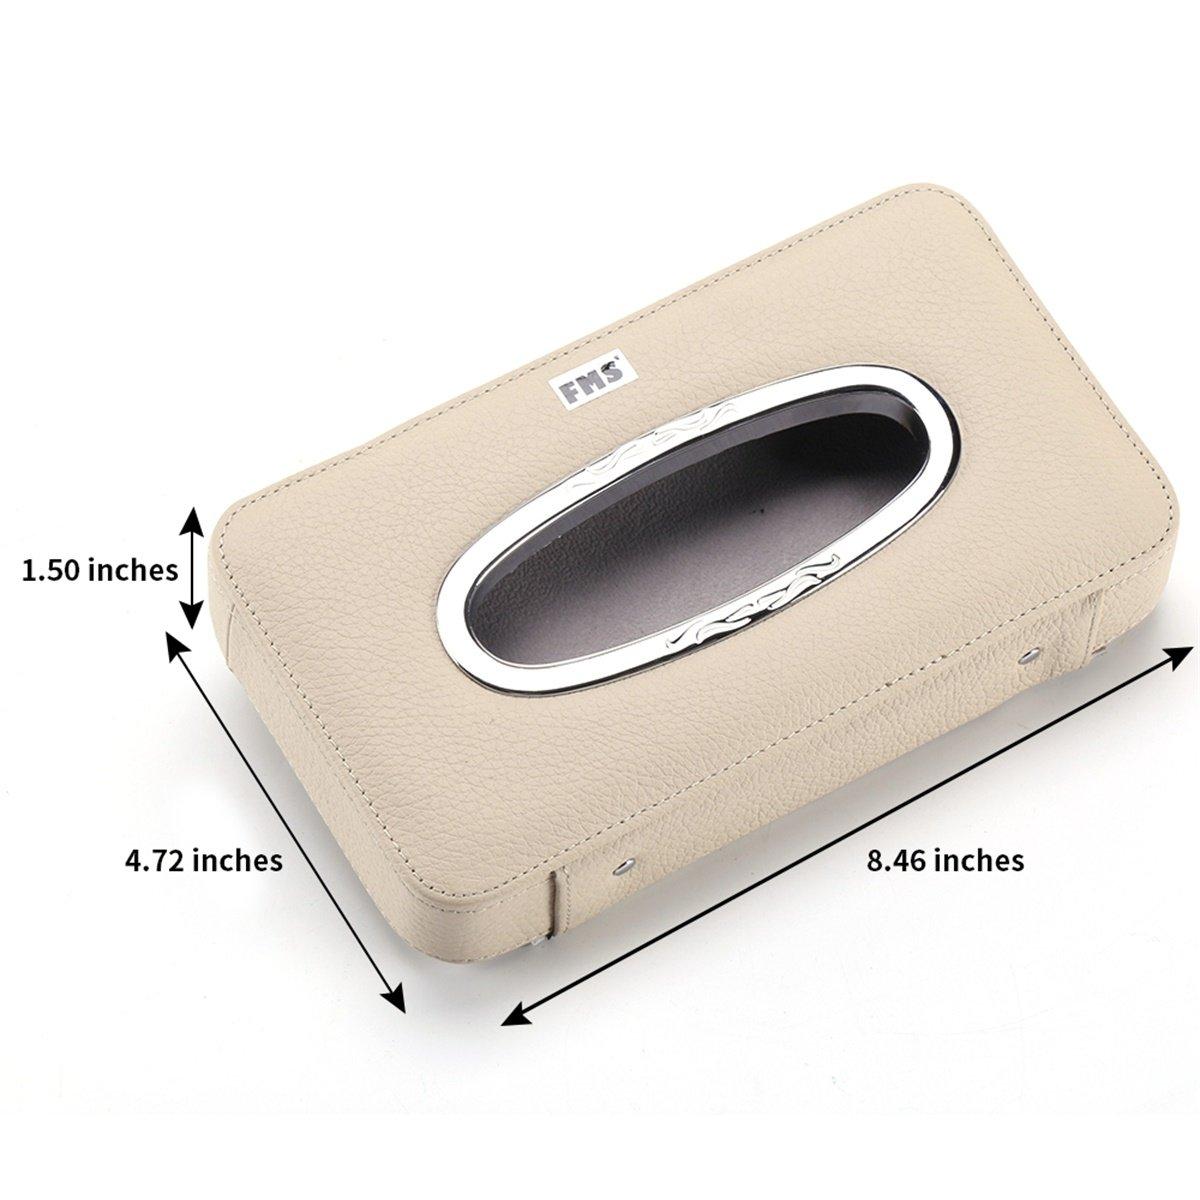 FMS Car Leather Tissue Case Holder for Sun Visor /& Seat Back with Tissue Refill Beige